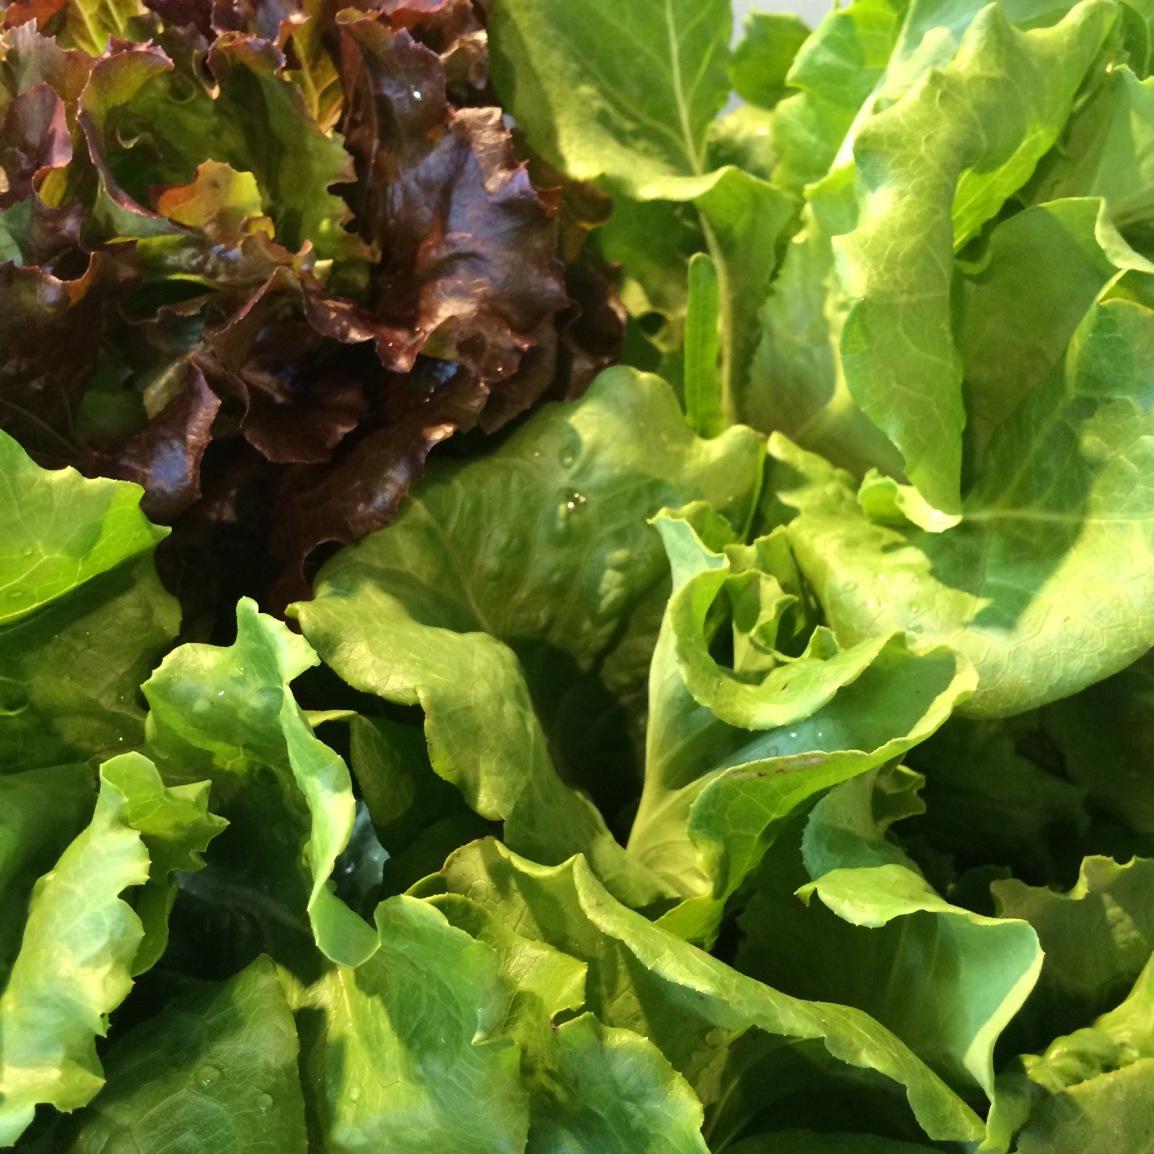 ARTfarm Salad Greens Thursday 7/29/2021, Preorders 5-6pm: Reserve your pickupslot!